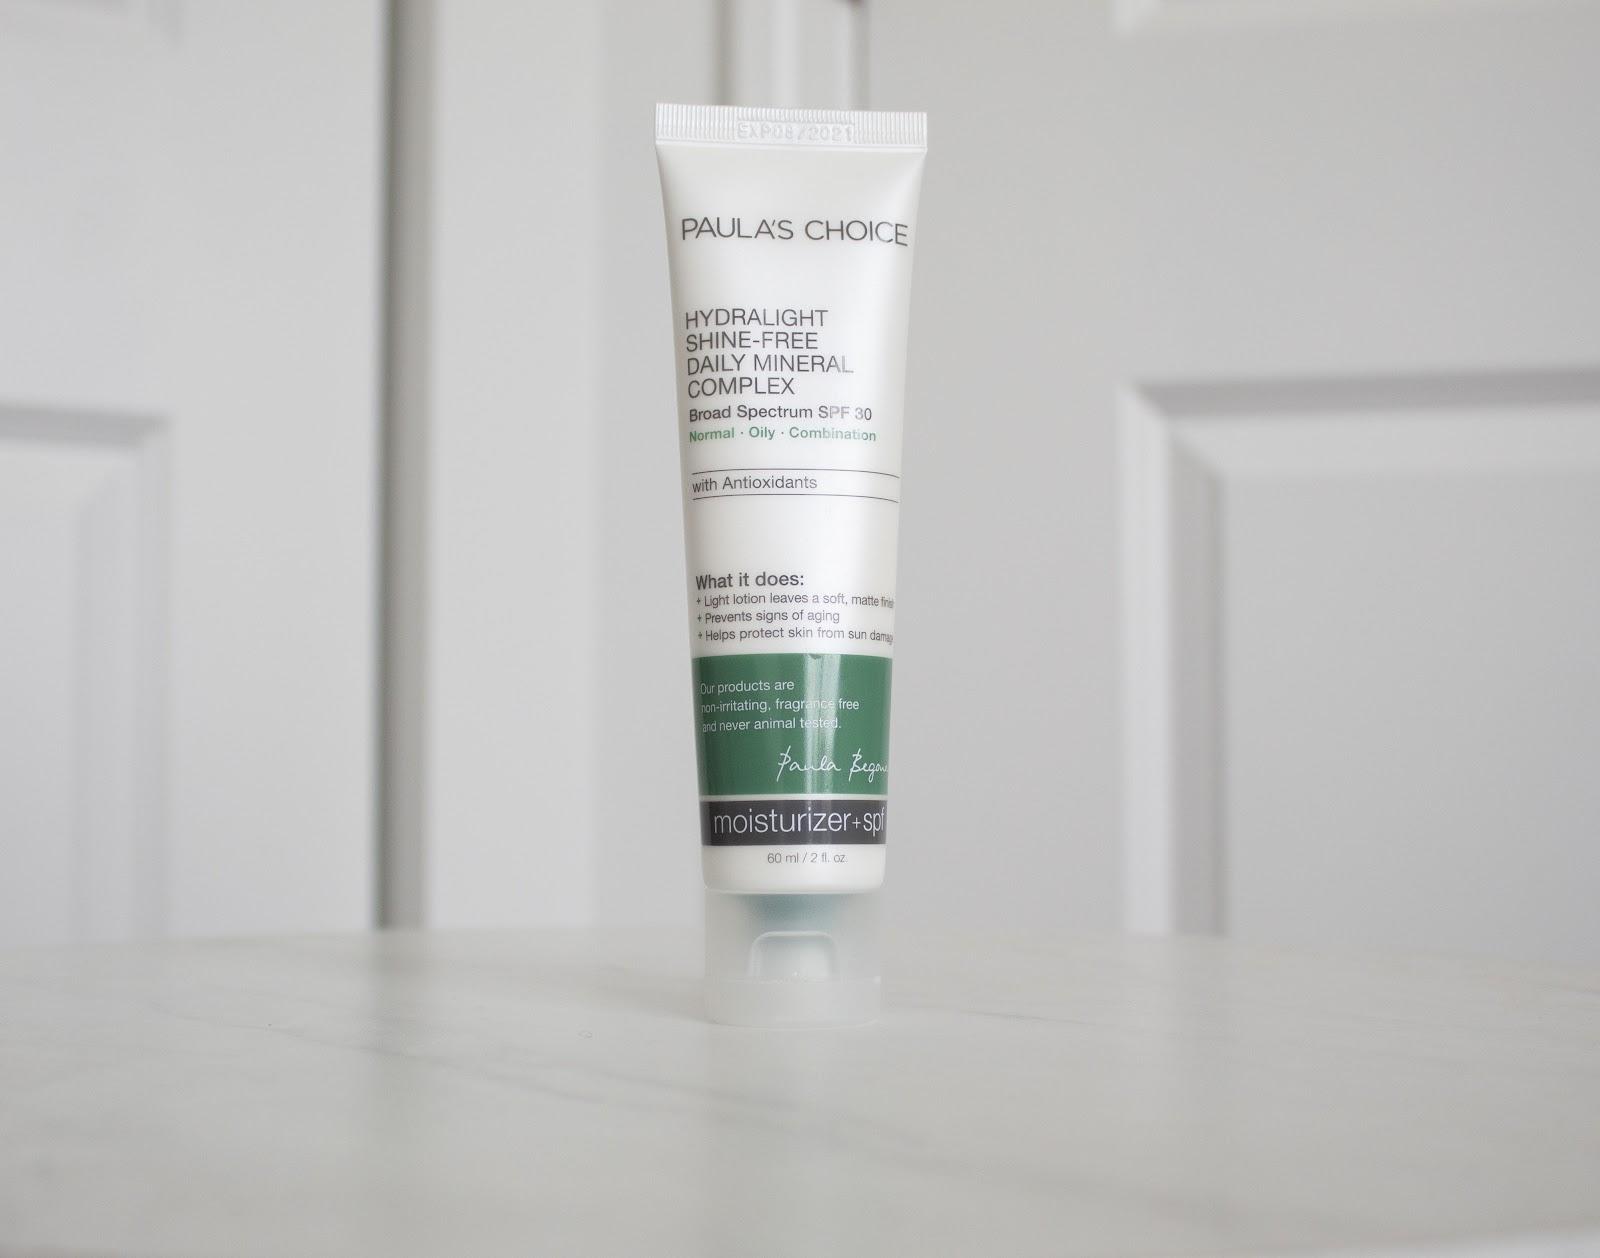 Paula's Choice Hydralight Mineral Sunscreen Patience & Pearls